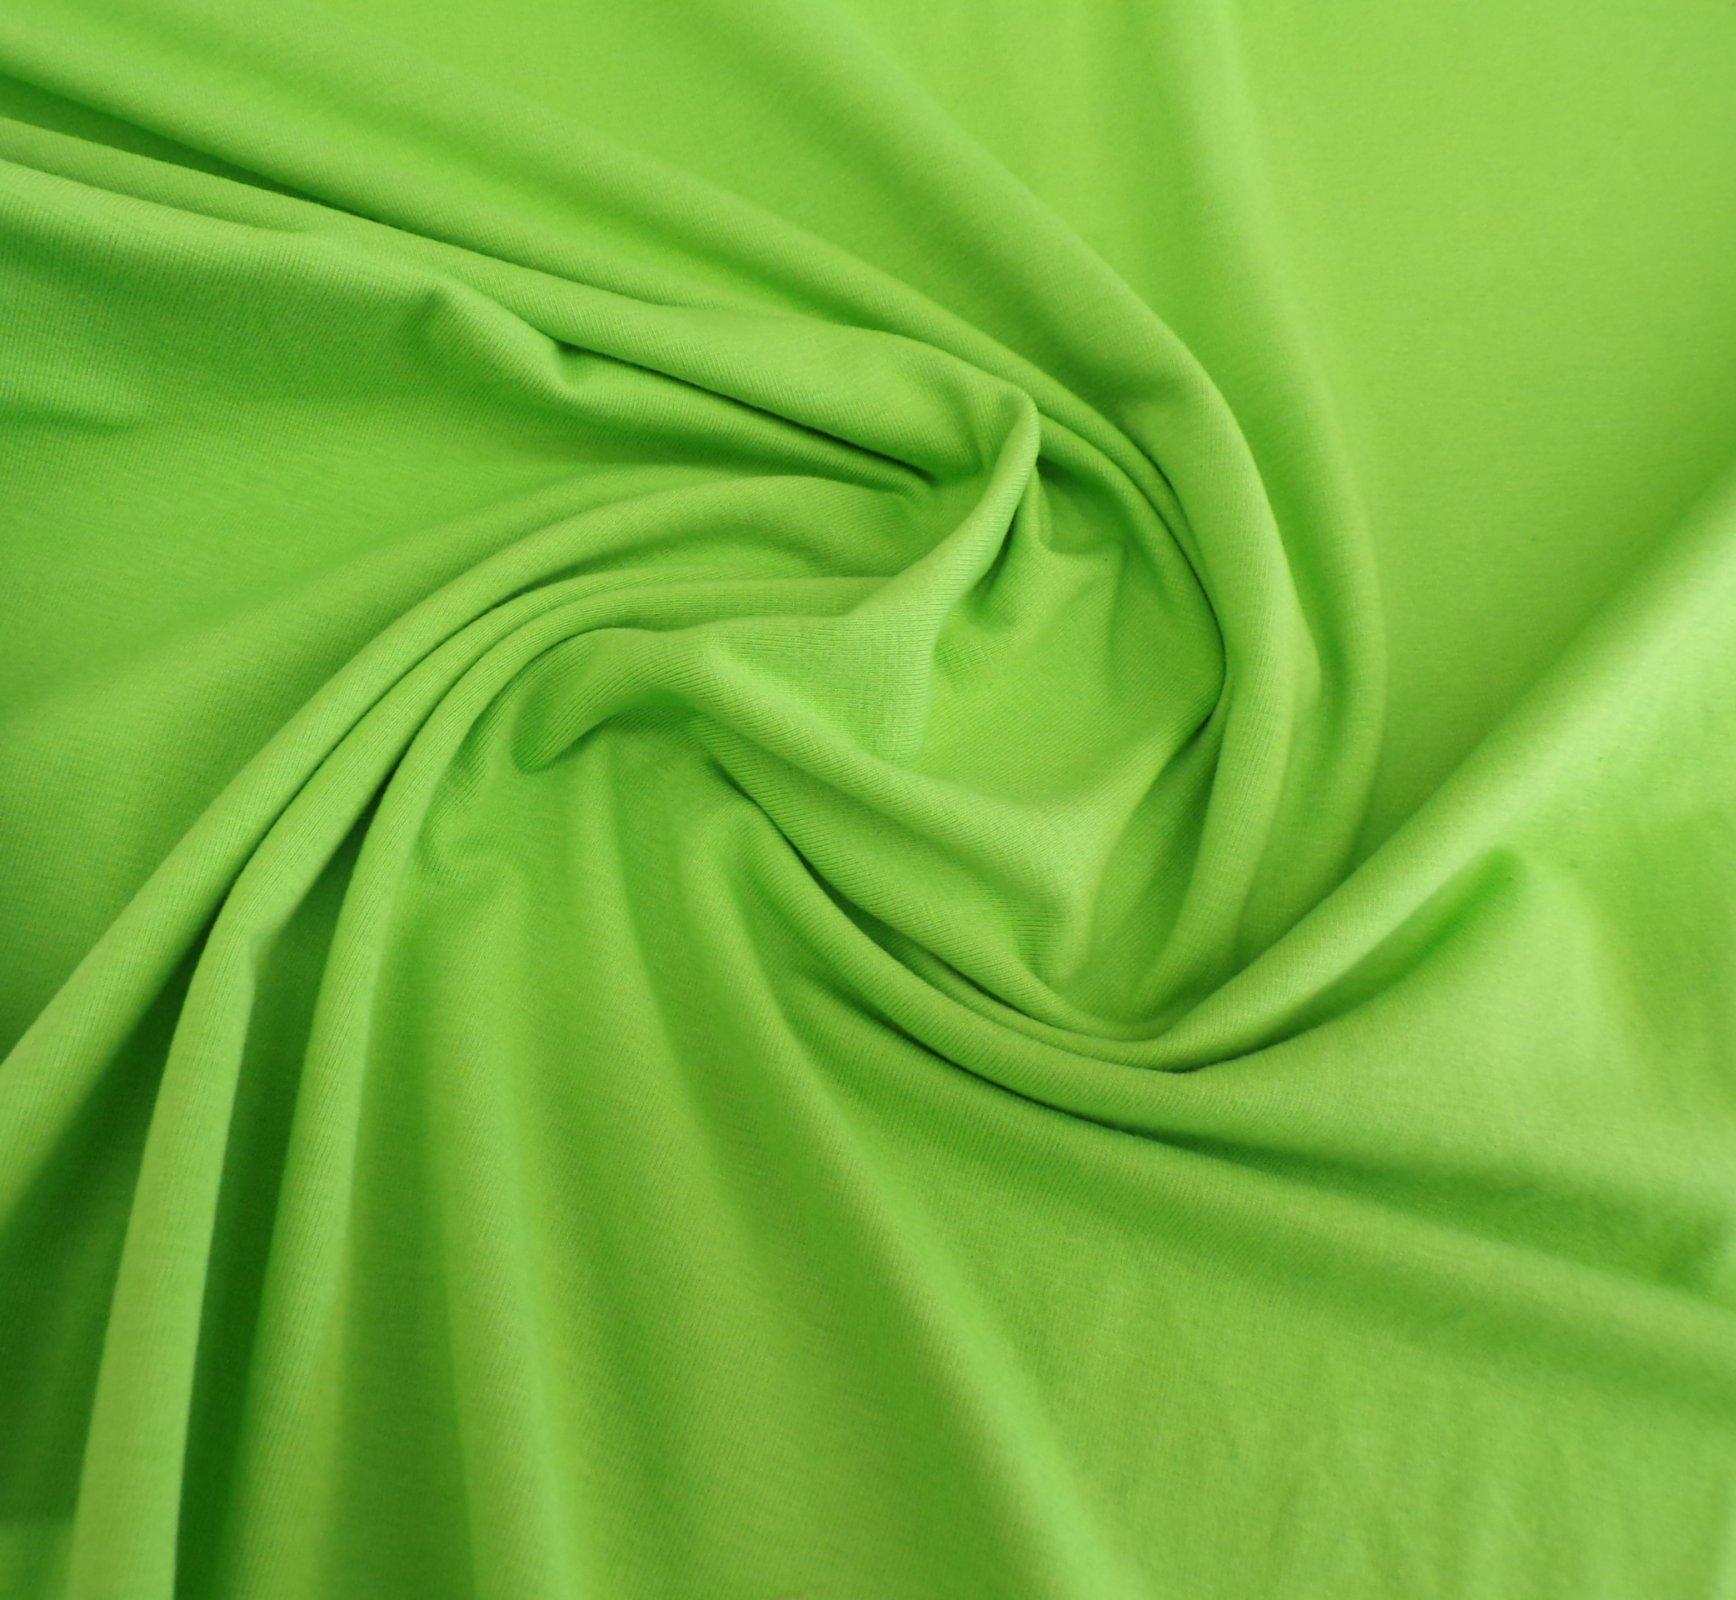 Cotton Lycra Jersey - Lime